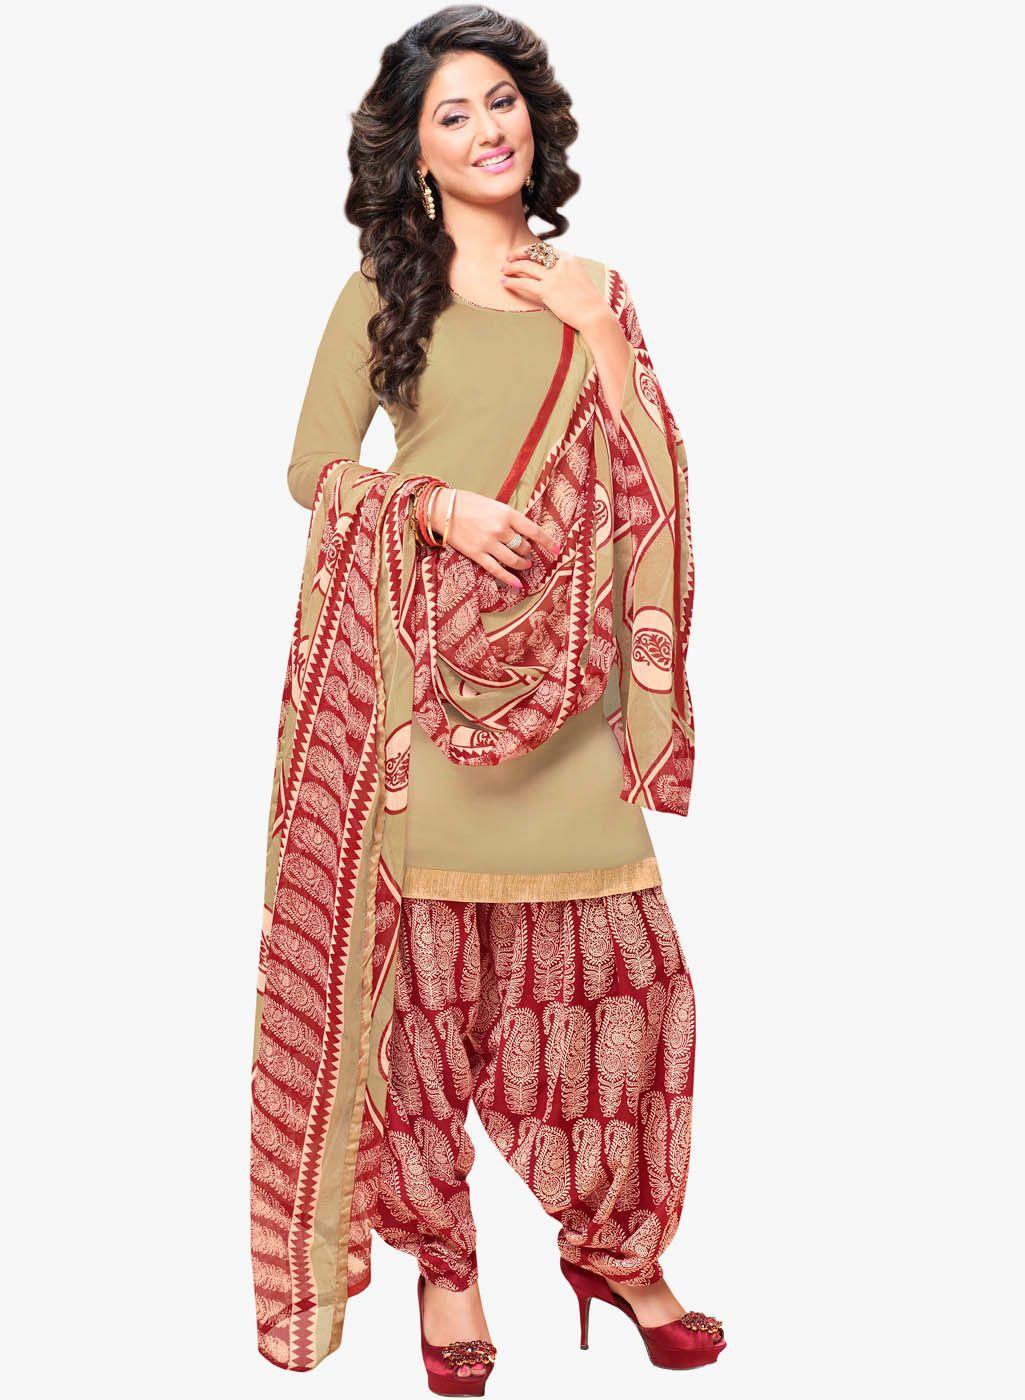 Desi Look Beige Embellished Dress Patiyala Dress Dress